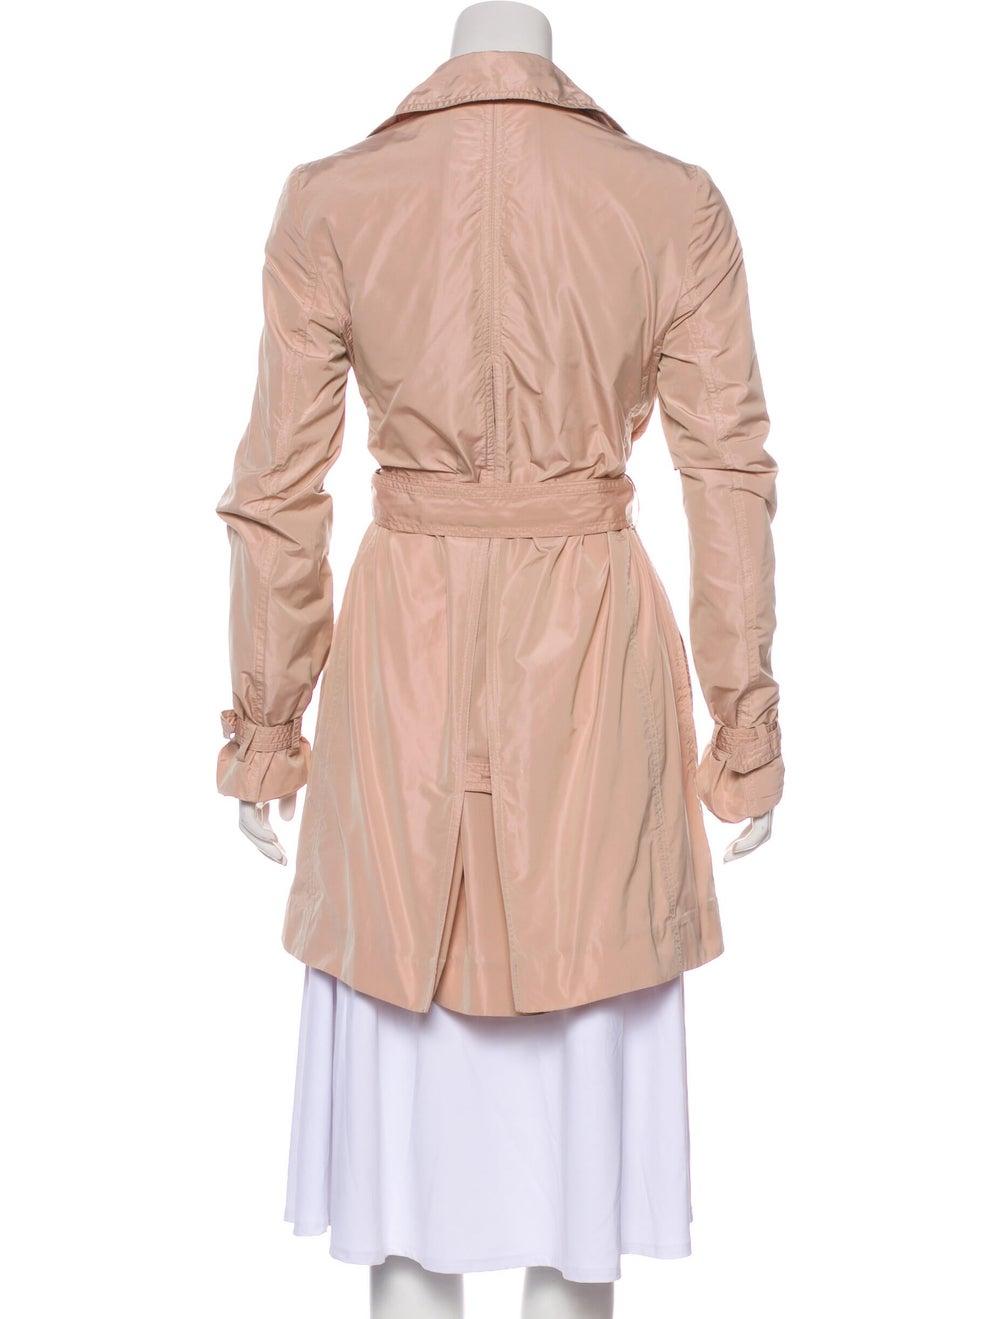 Stella McCartney Trench Coat Pink - image 3